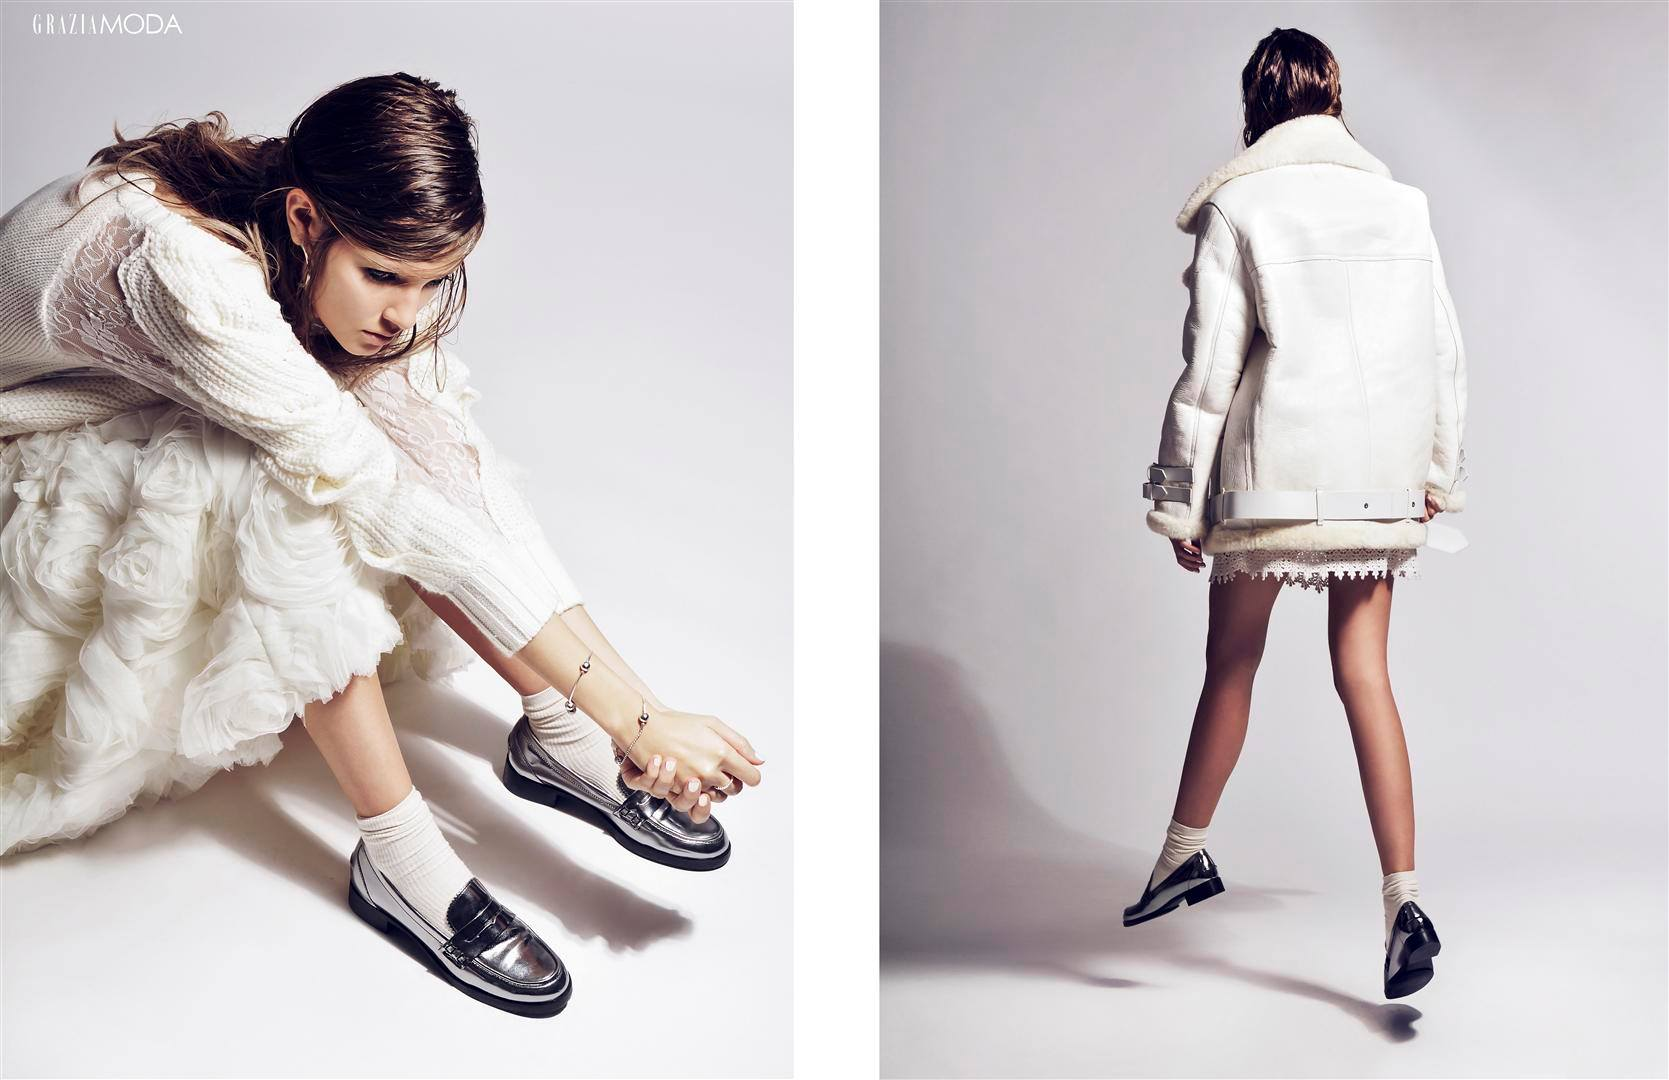 grazia, art direction & style